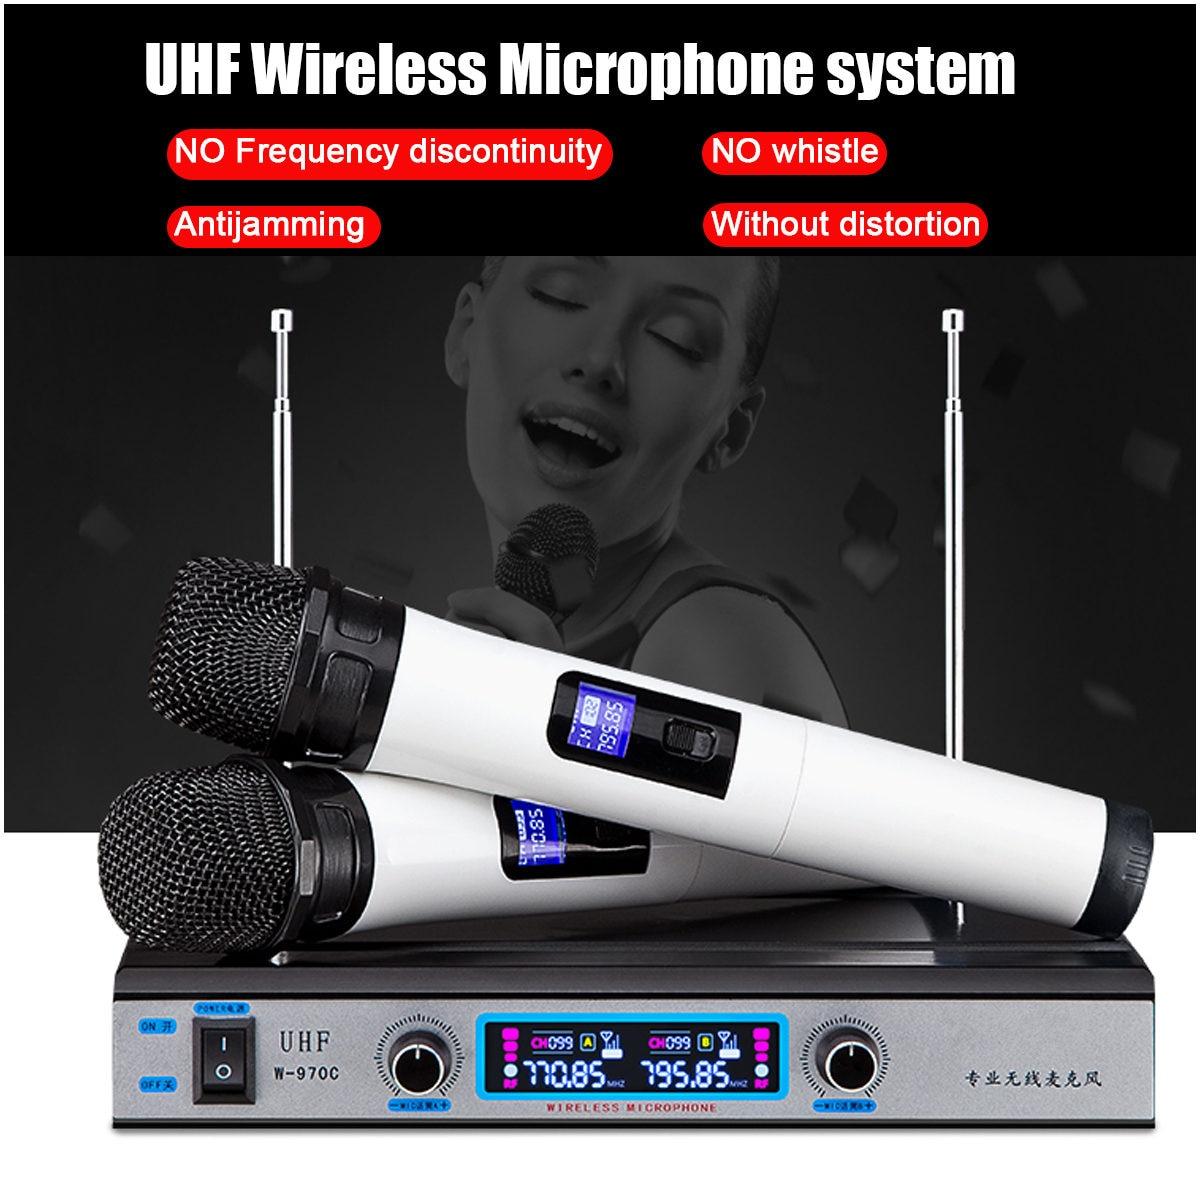 handheld dual uhf wireless microphone system receiver cordless handheld mic kareoke ktv home. Black Bedroom Furniture Sets. Home Design Ideas